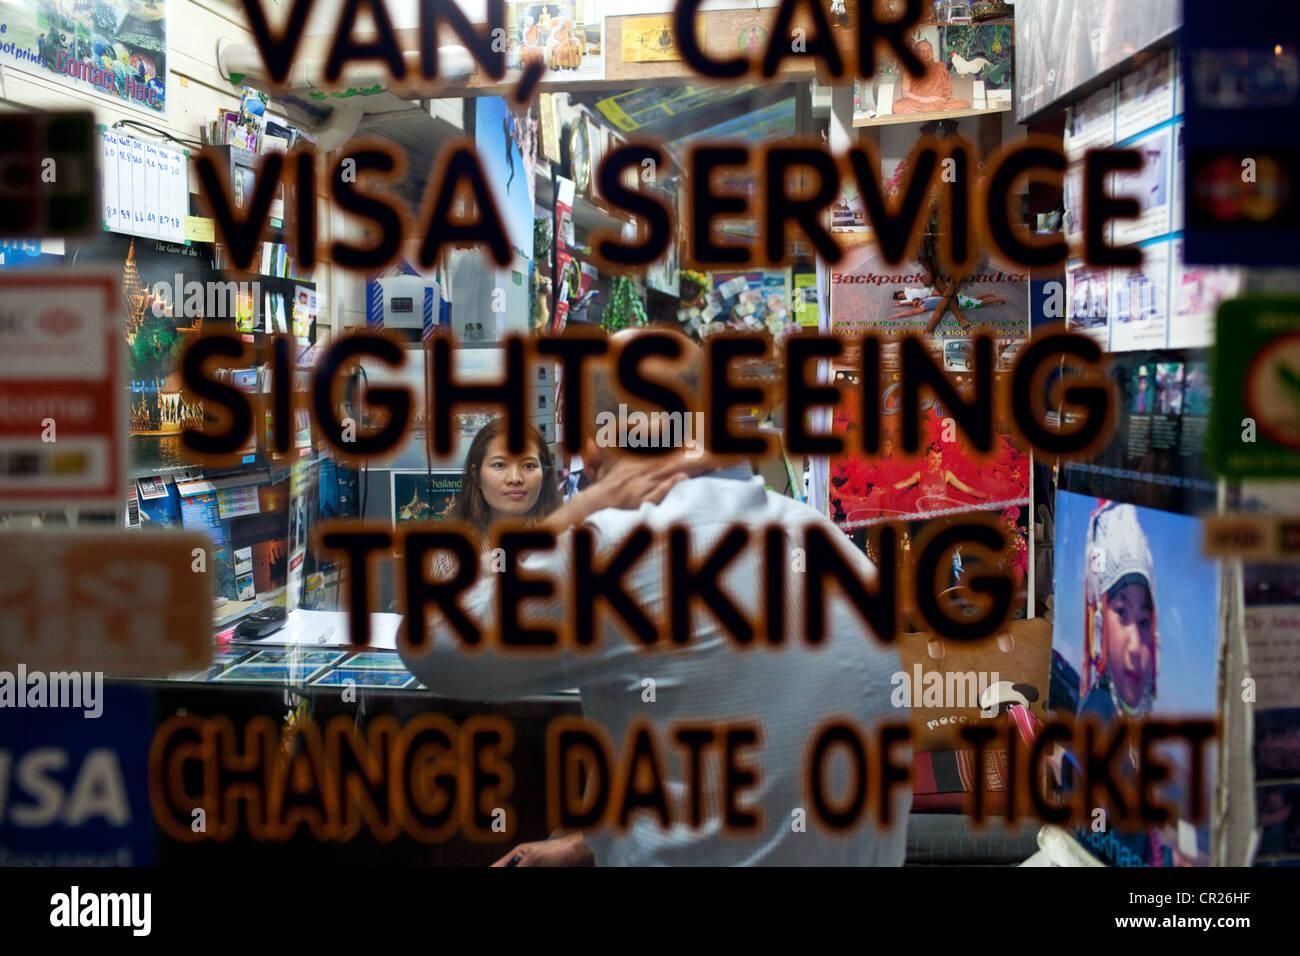 A travel agency near Khao San Road, the backpacker capital of the universe, Bangkok, Thailand. - Stock Image